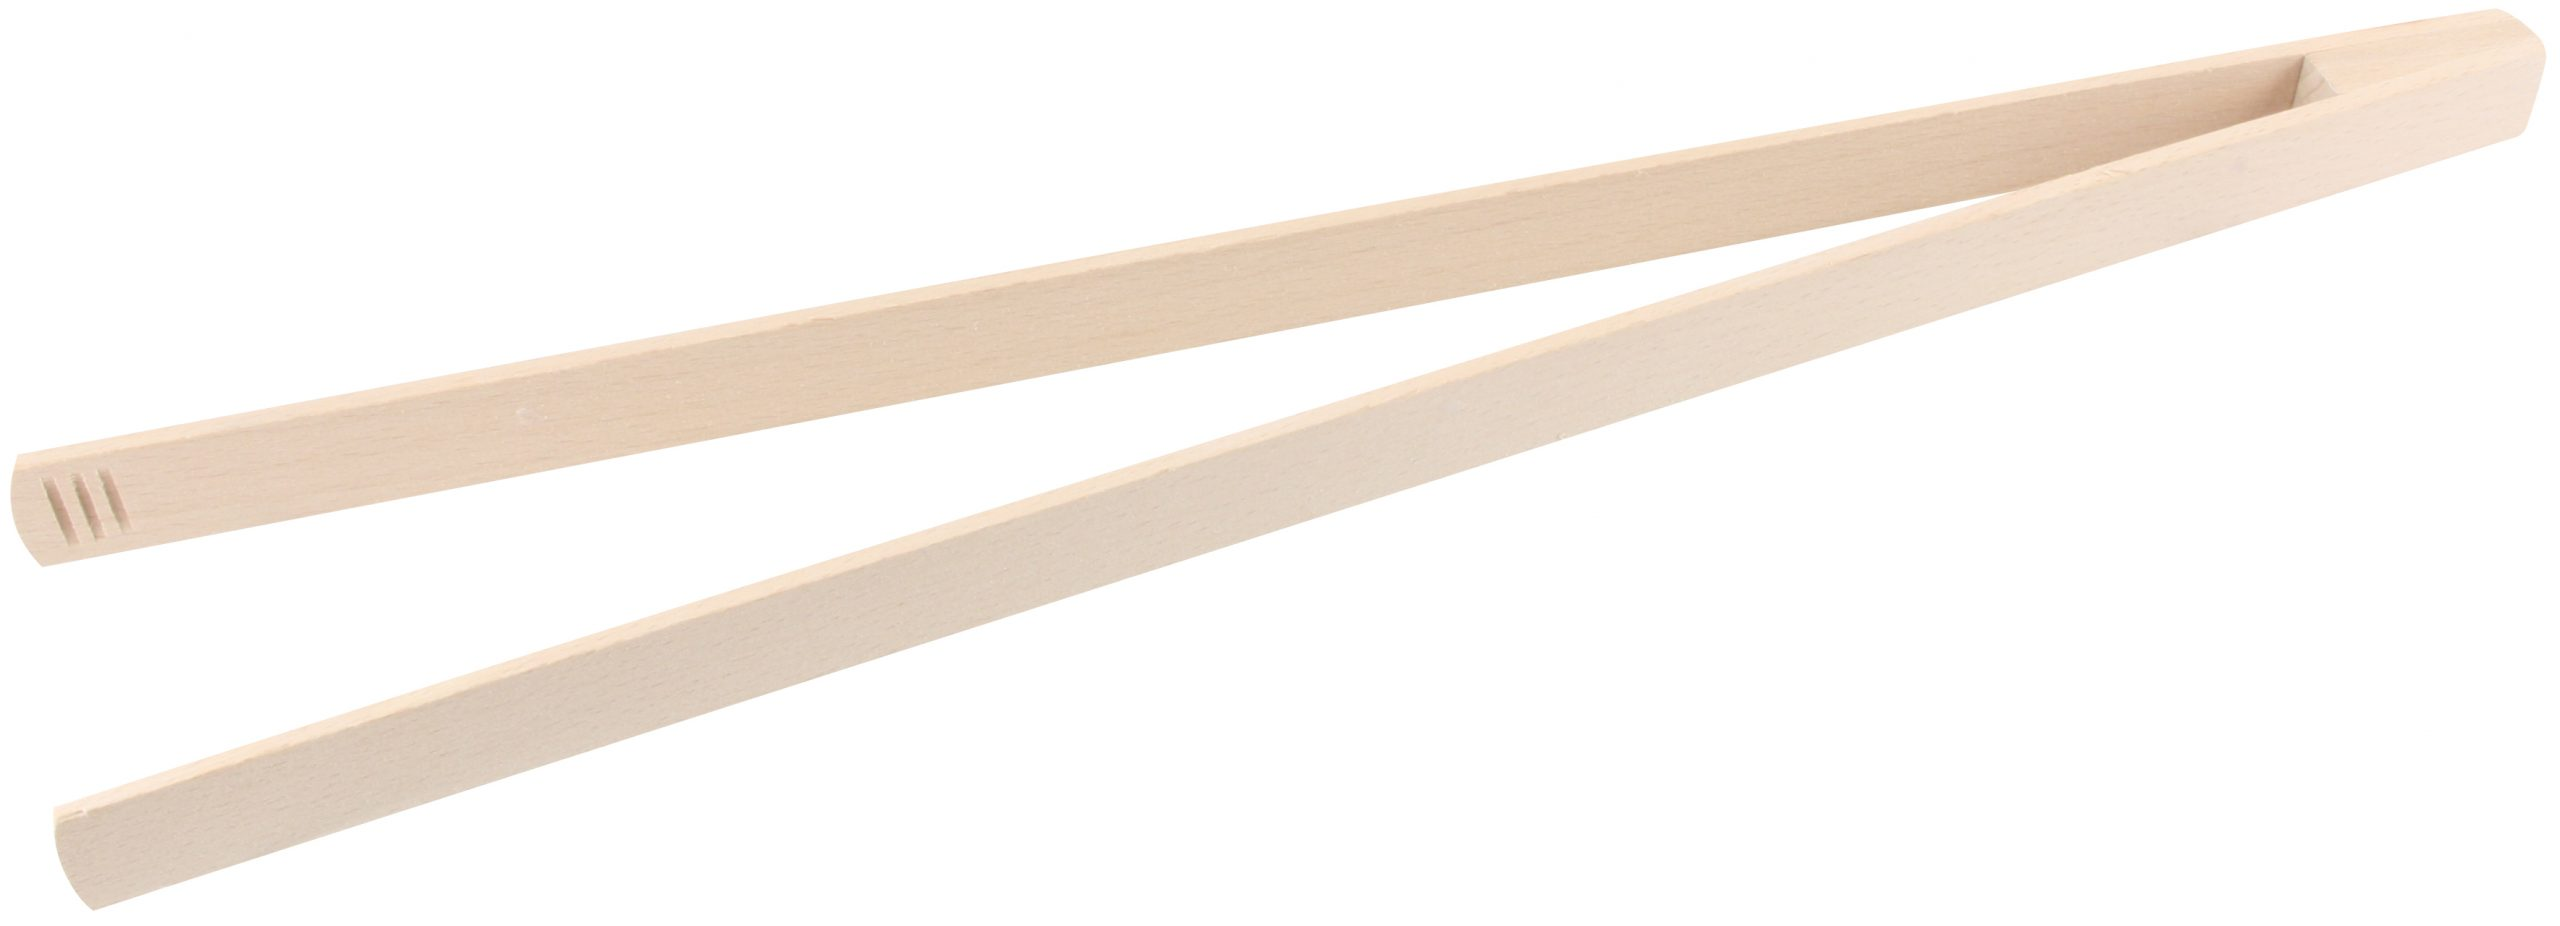 Holzzange 50cm Buche hängb